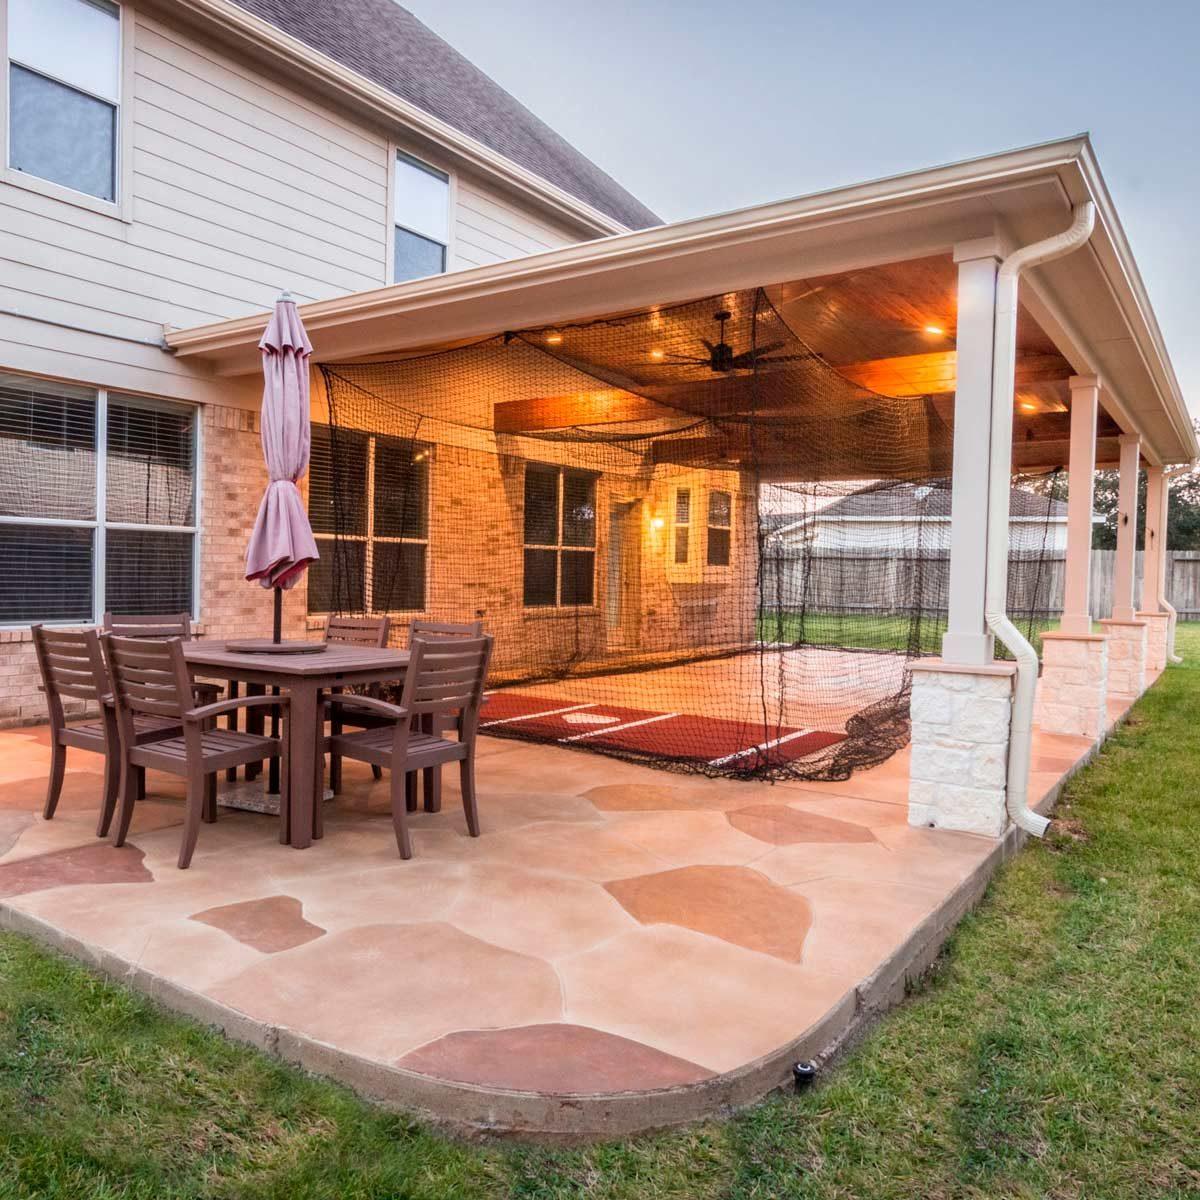 12 stamped concrete patio ideas we love